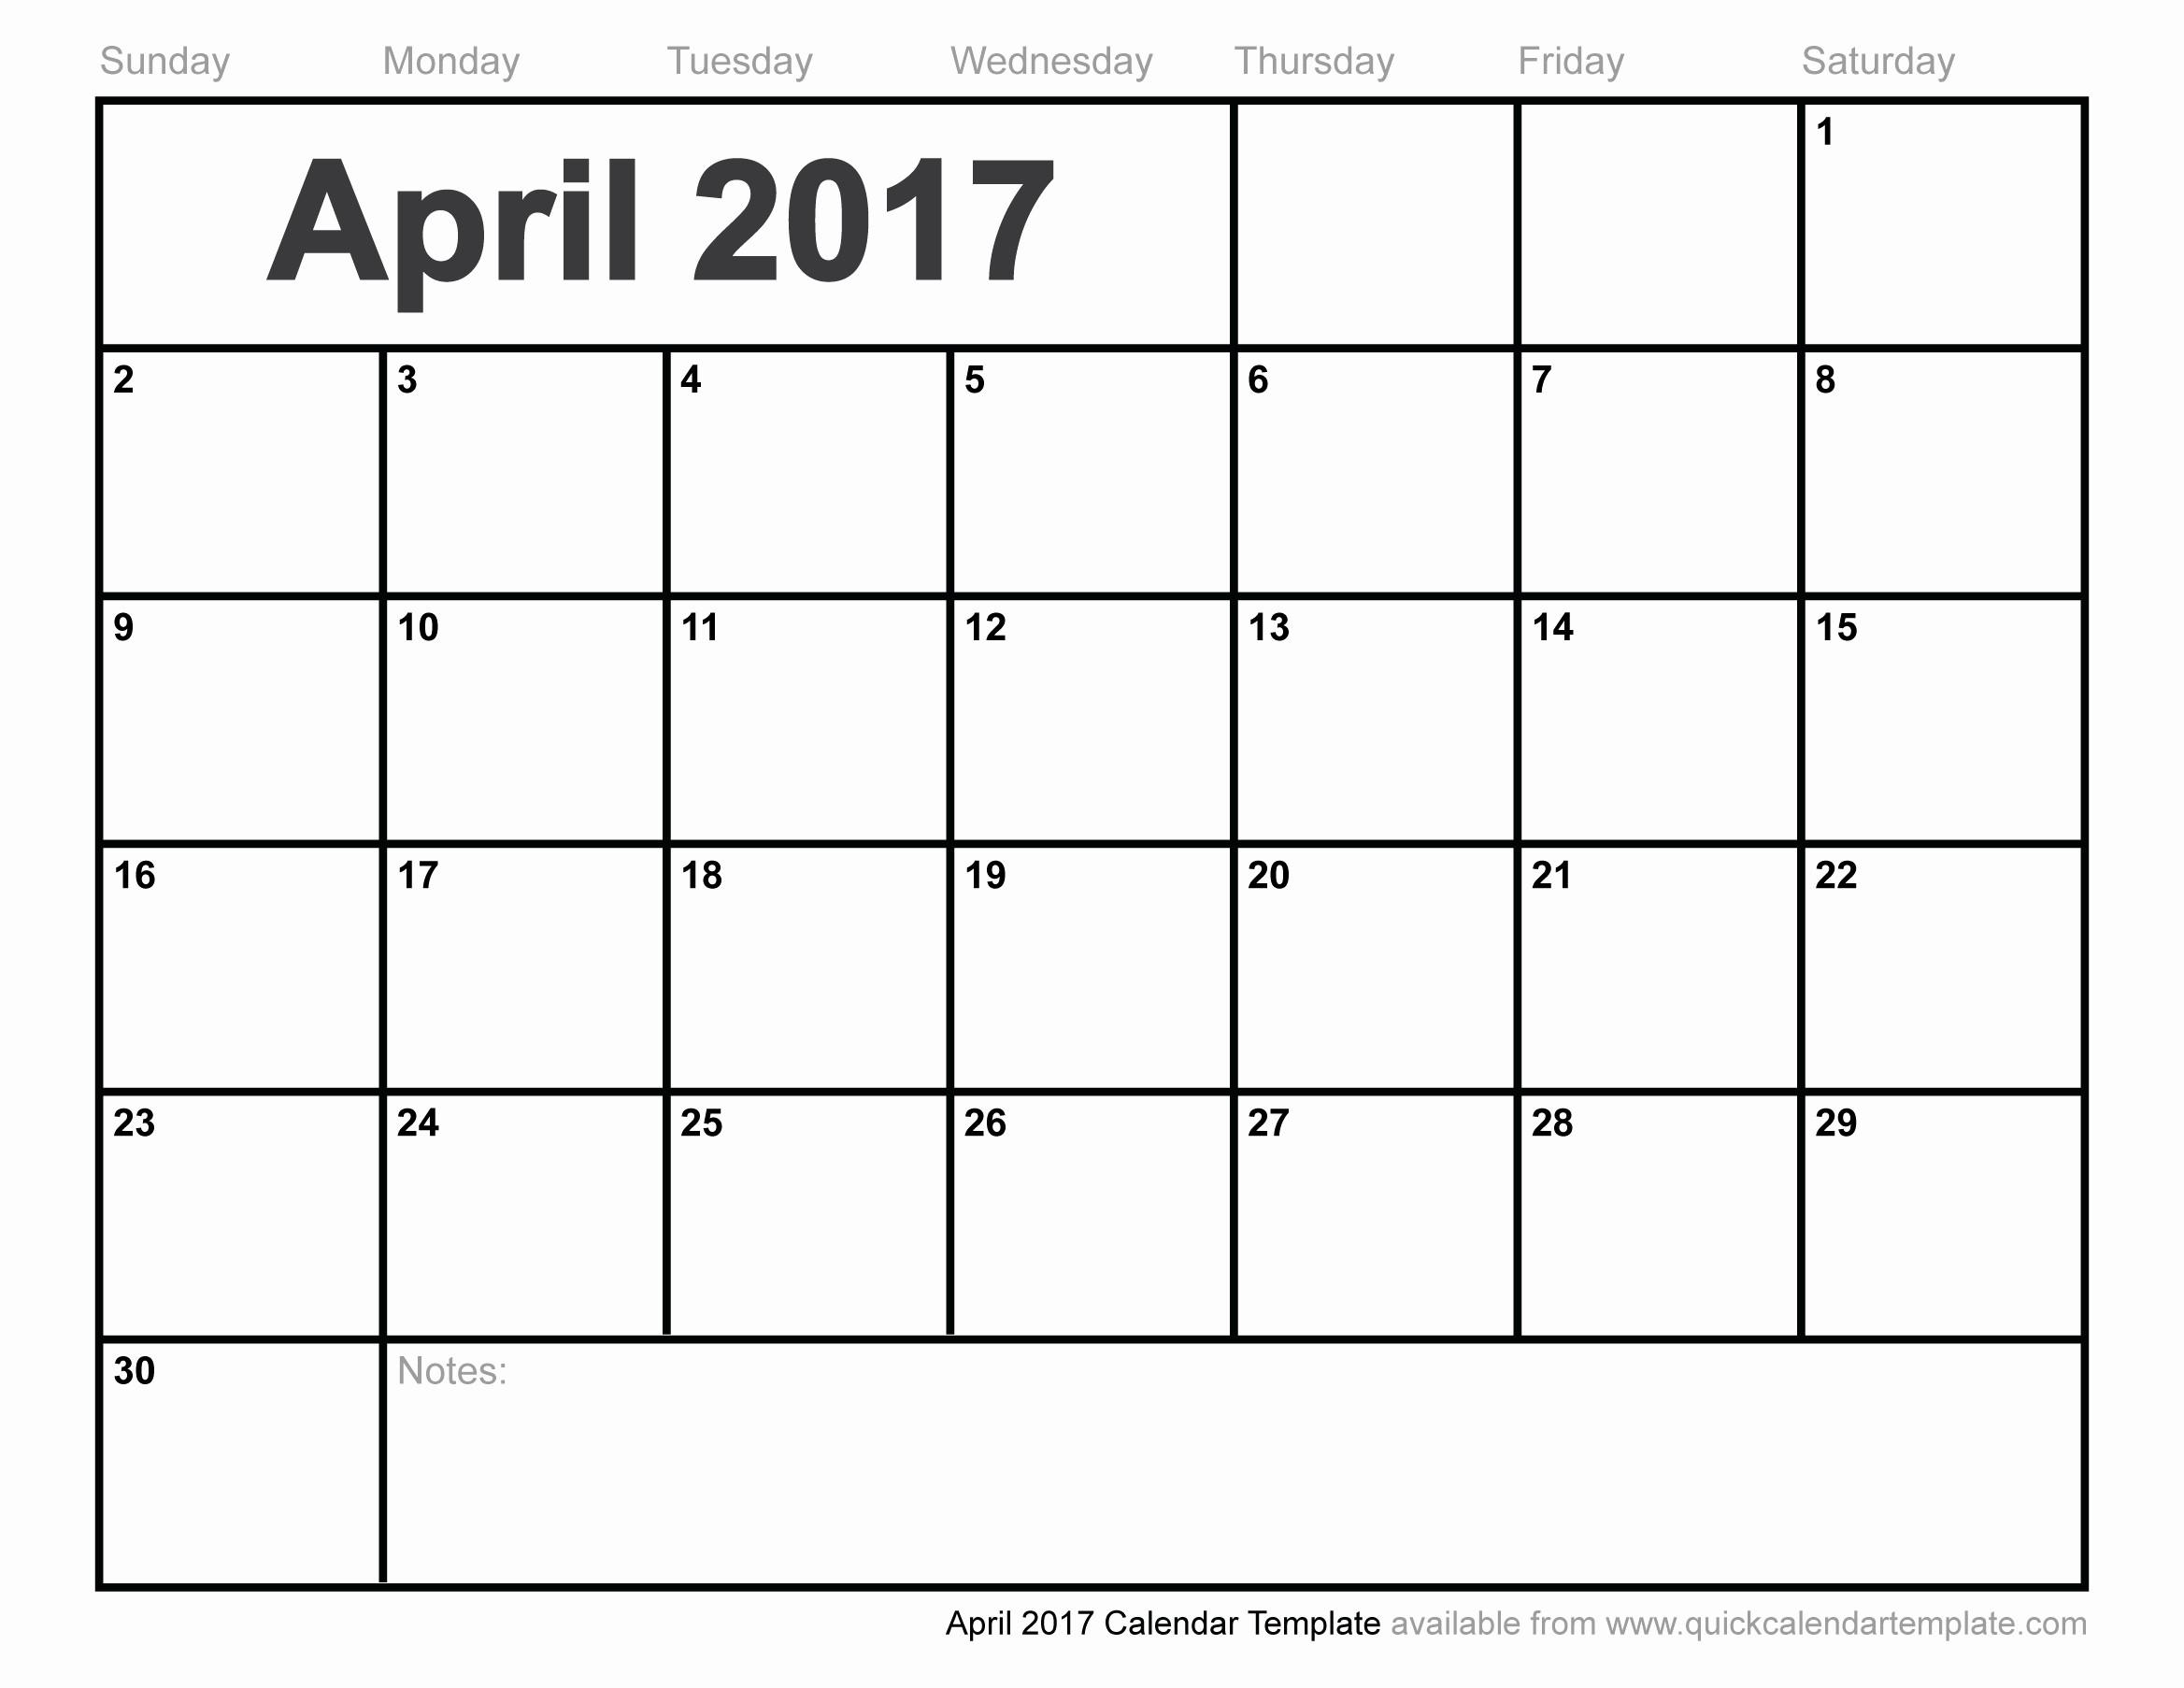 Free Blank Printable Calendar 2017 Unique Blank April 2017 Calendar